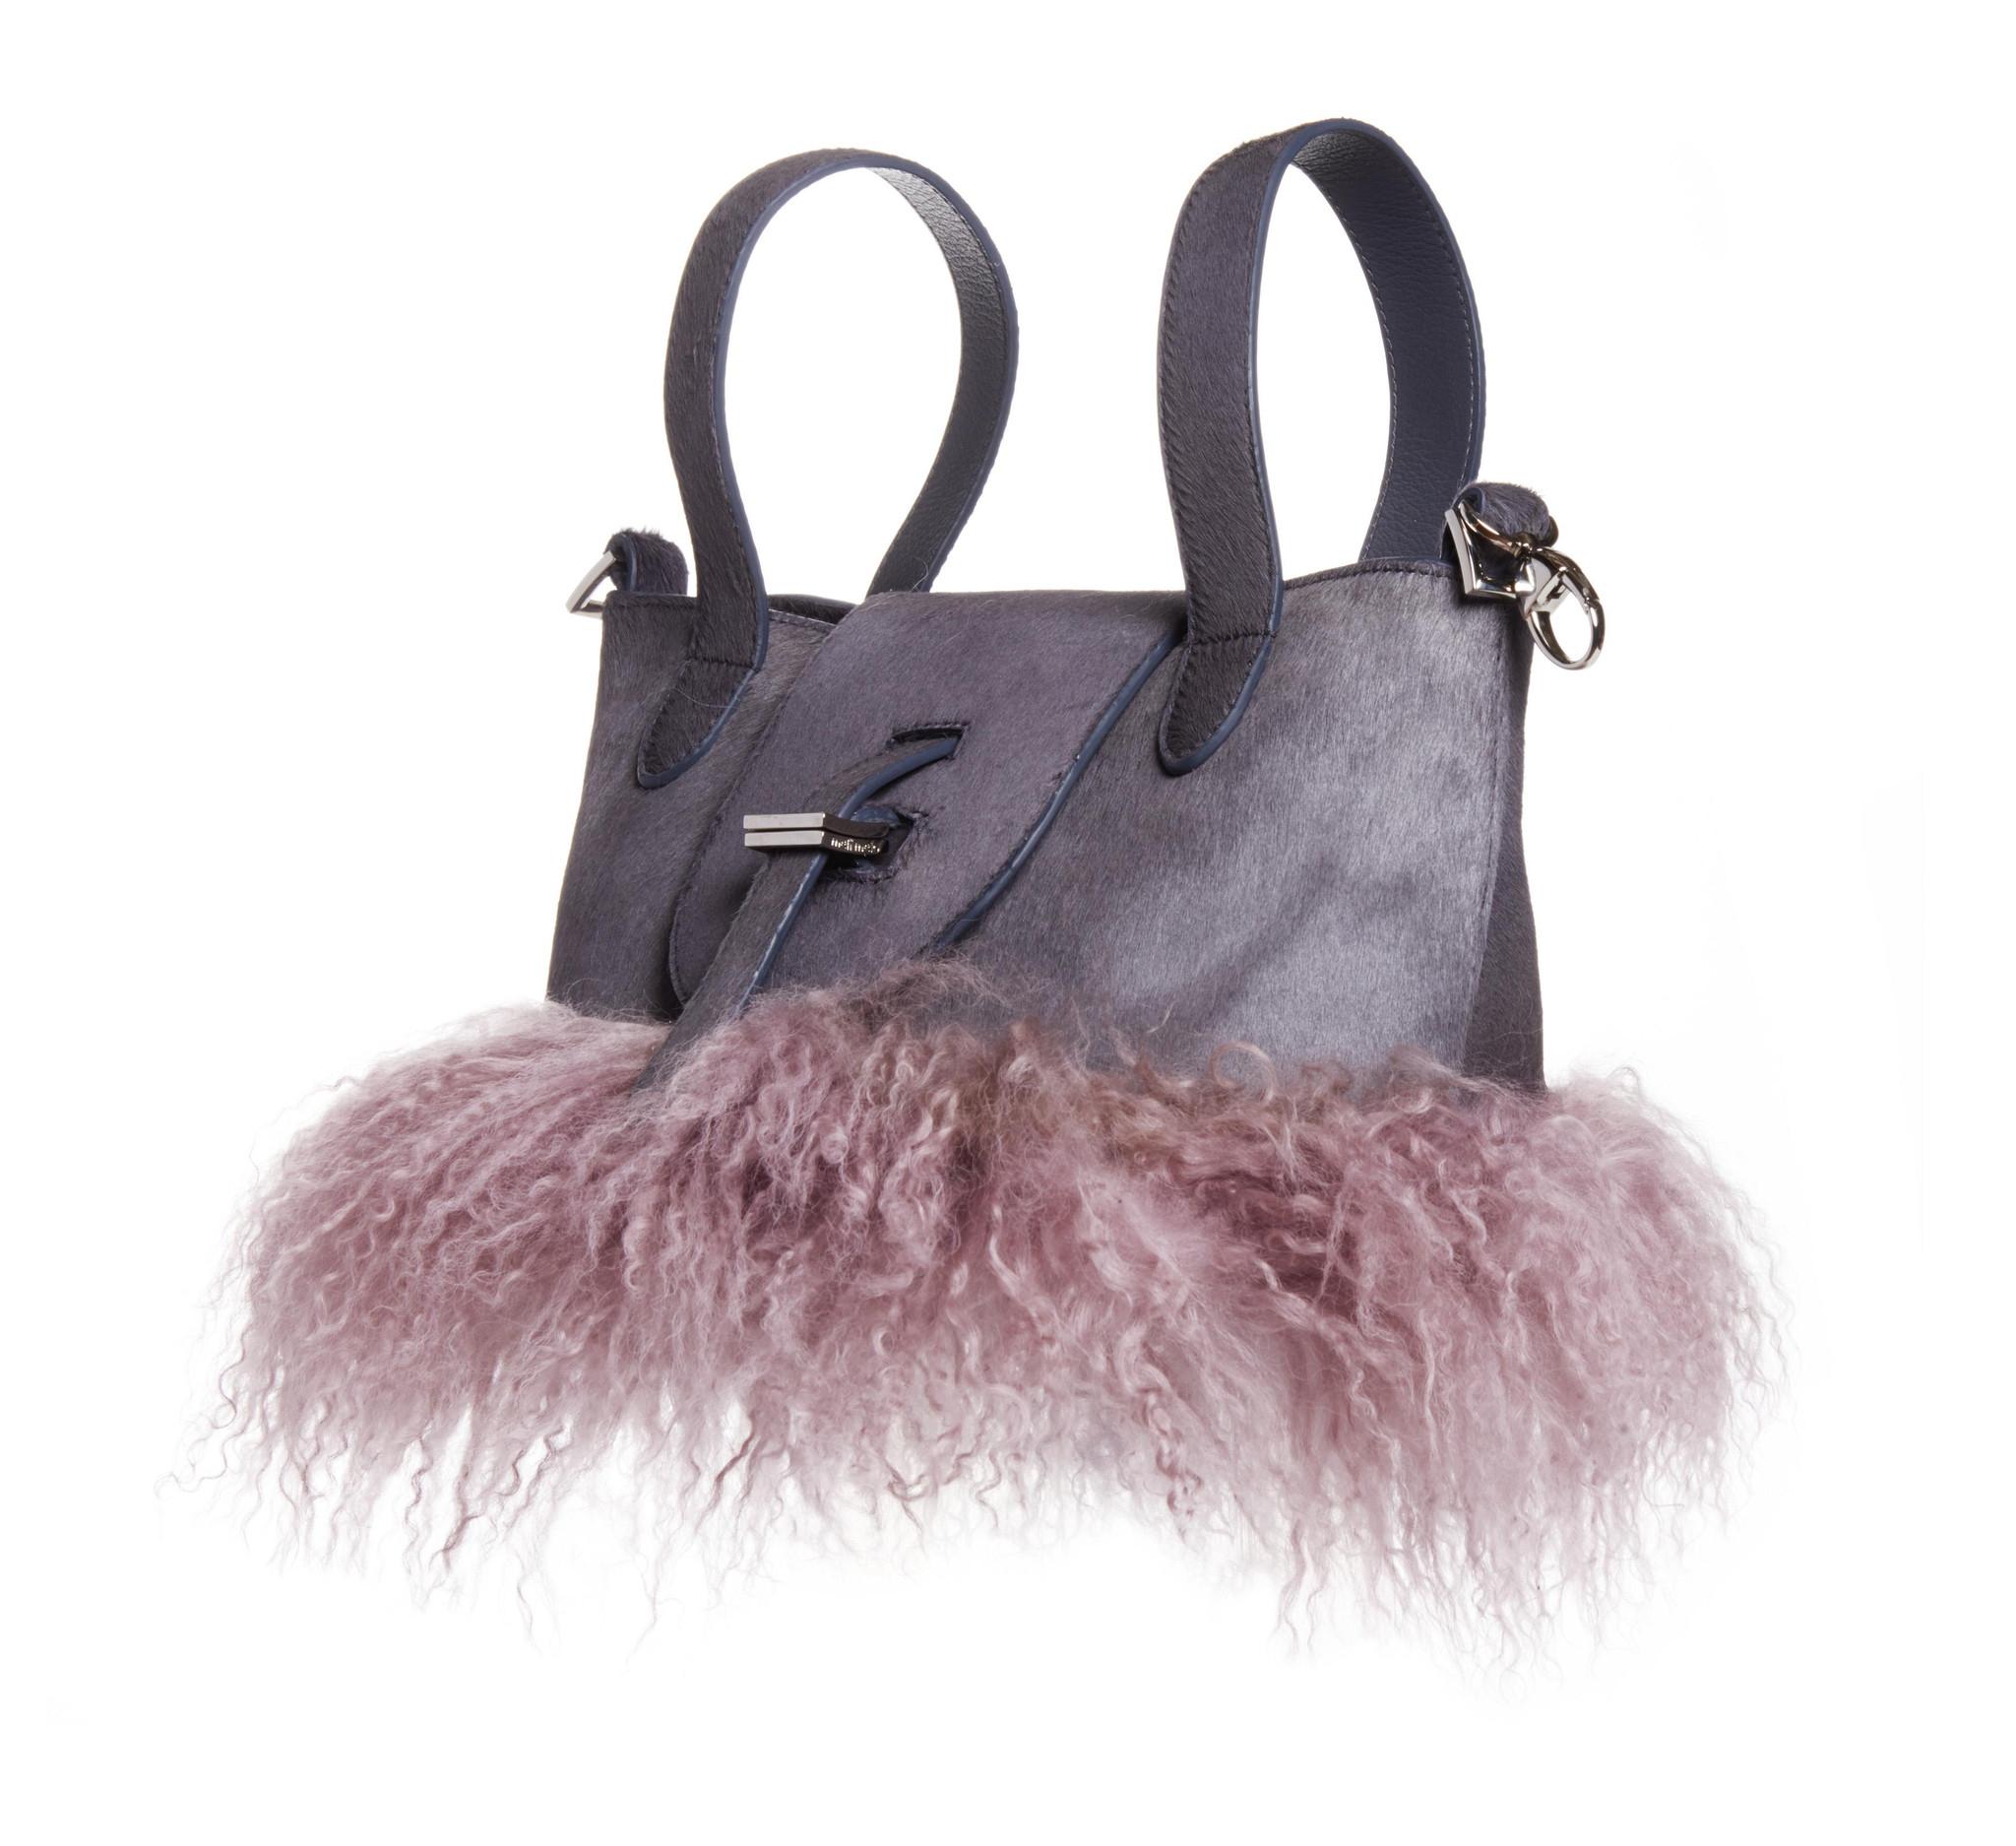 lyst meli melo women 39 s micro box cross body bag in gray. Black Bedroom Furniture Sets. Home Design Ideas